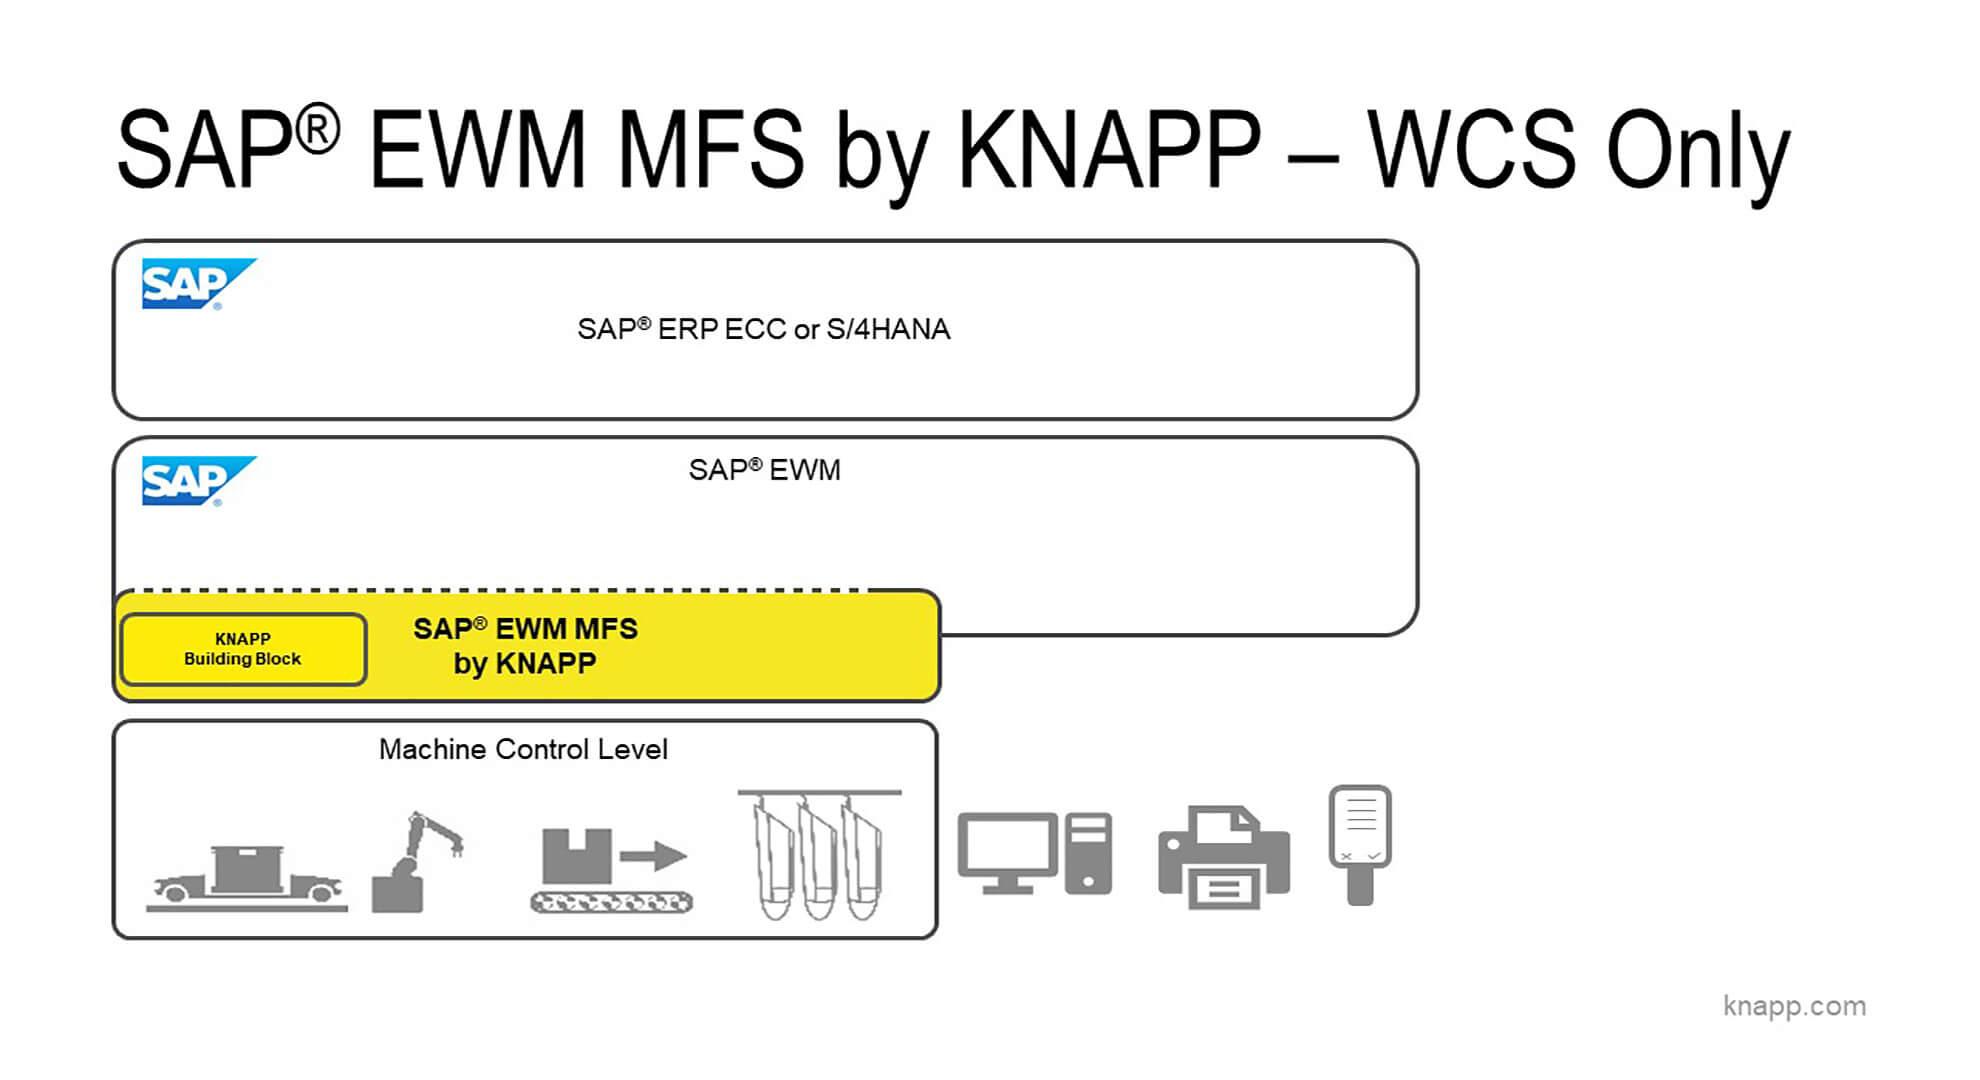 Systemlandschaft - SAP EWM incl. MFS als reines WCS